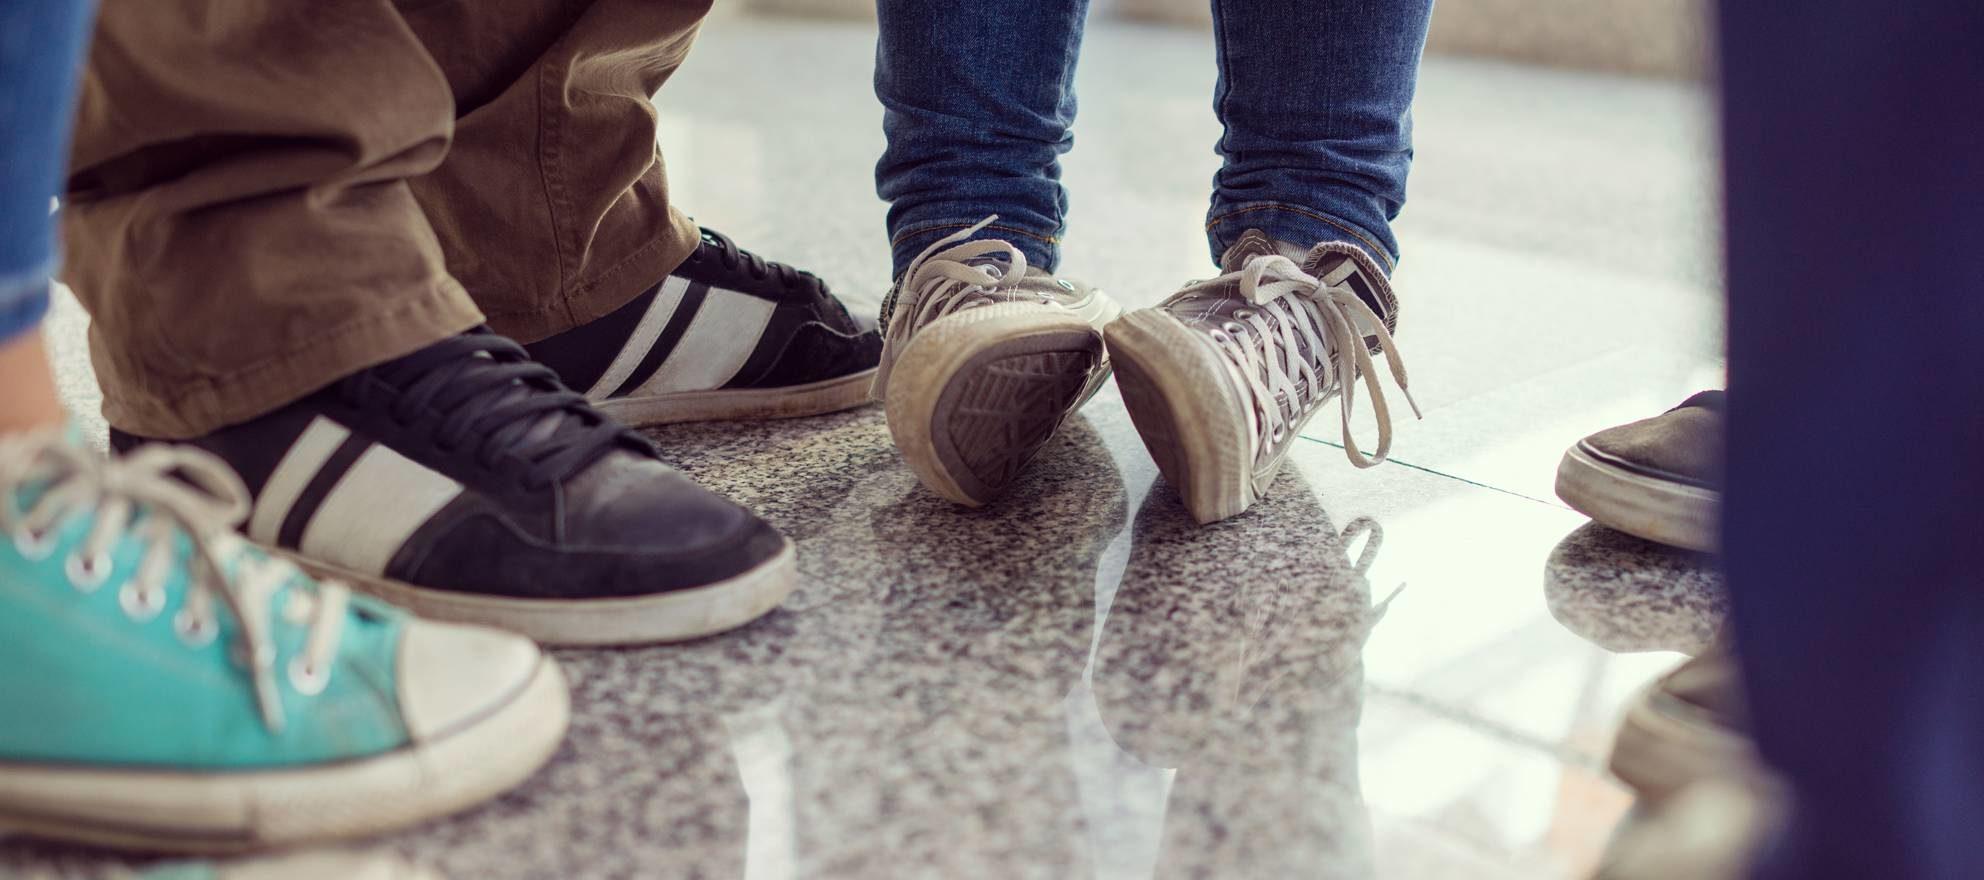 3 steps to begin working with millennials